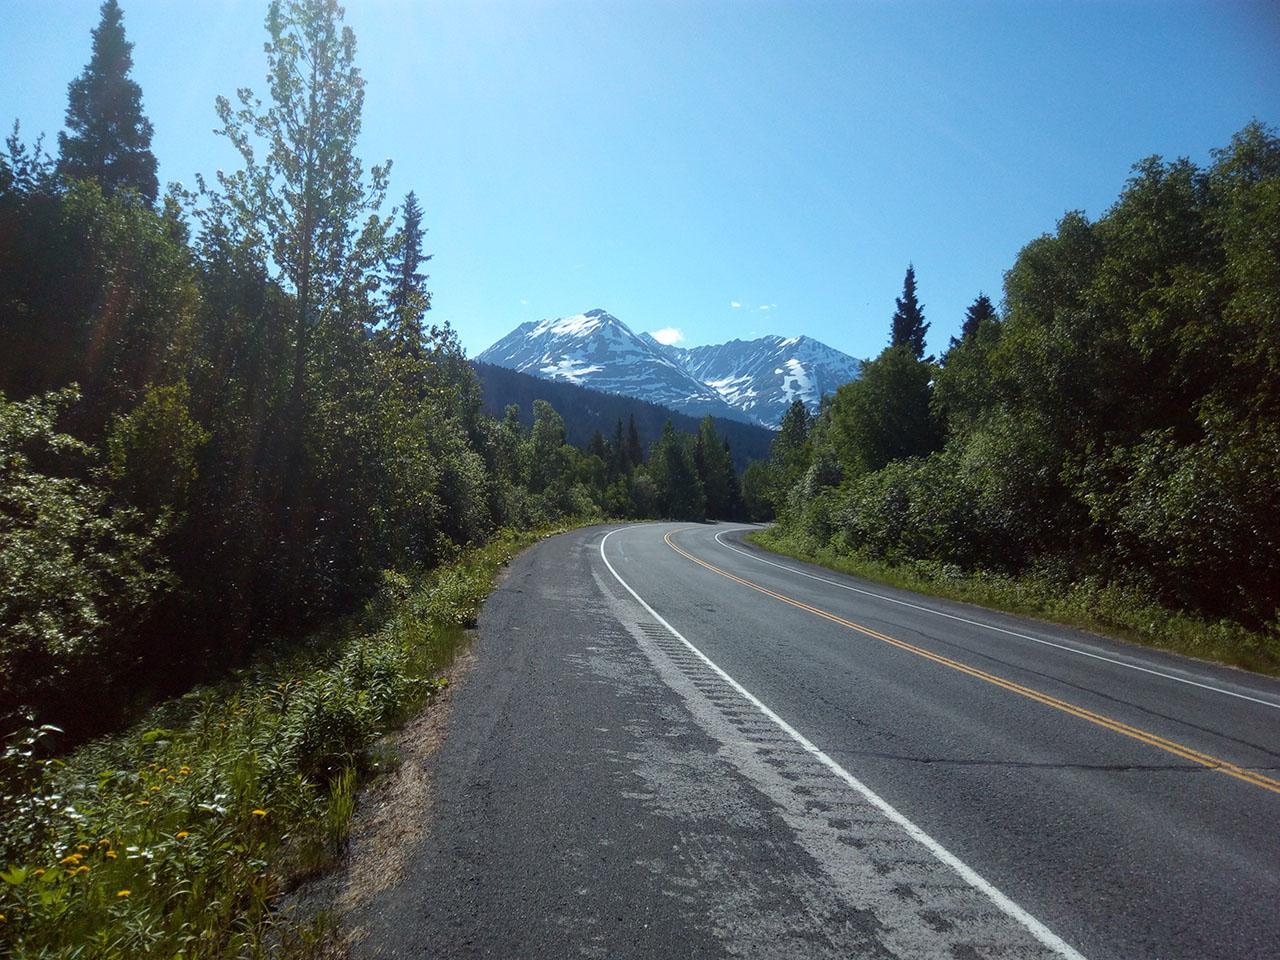 Paved road and Alaska mountains.